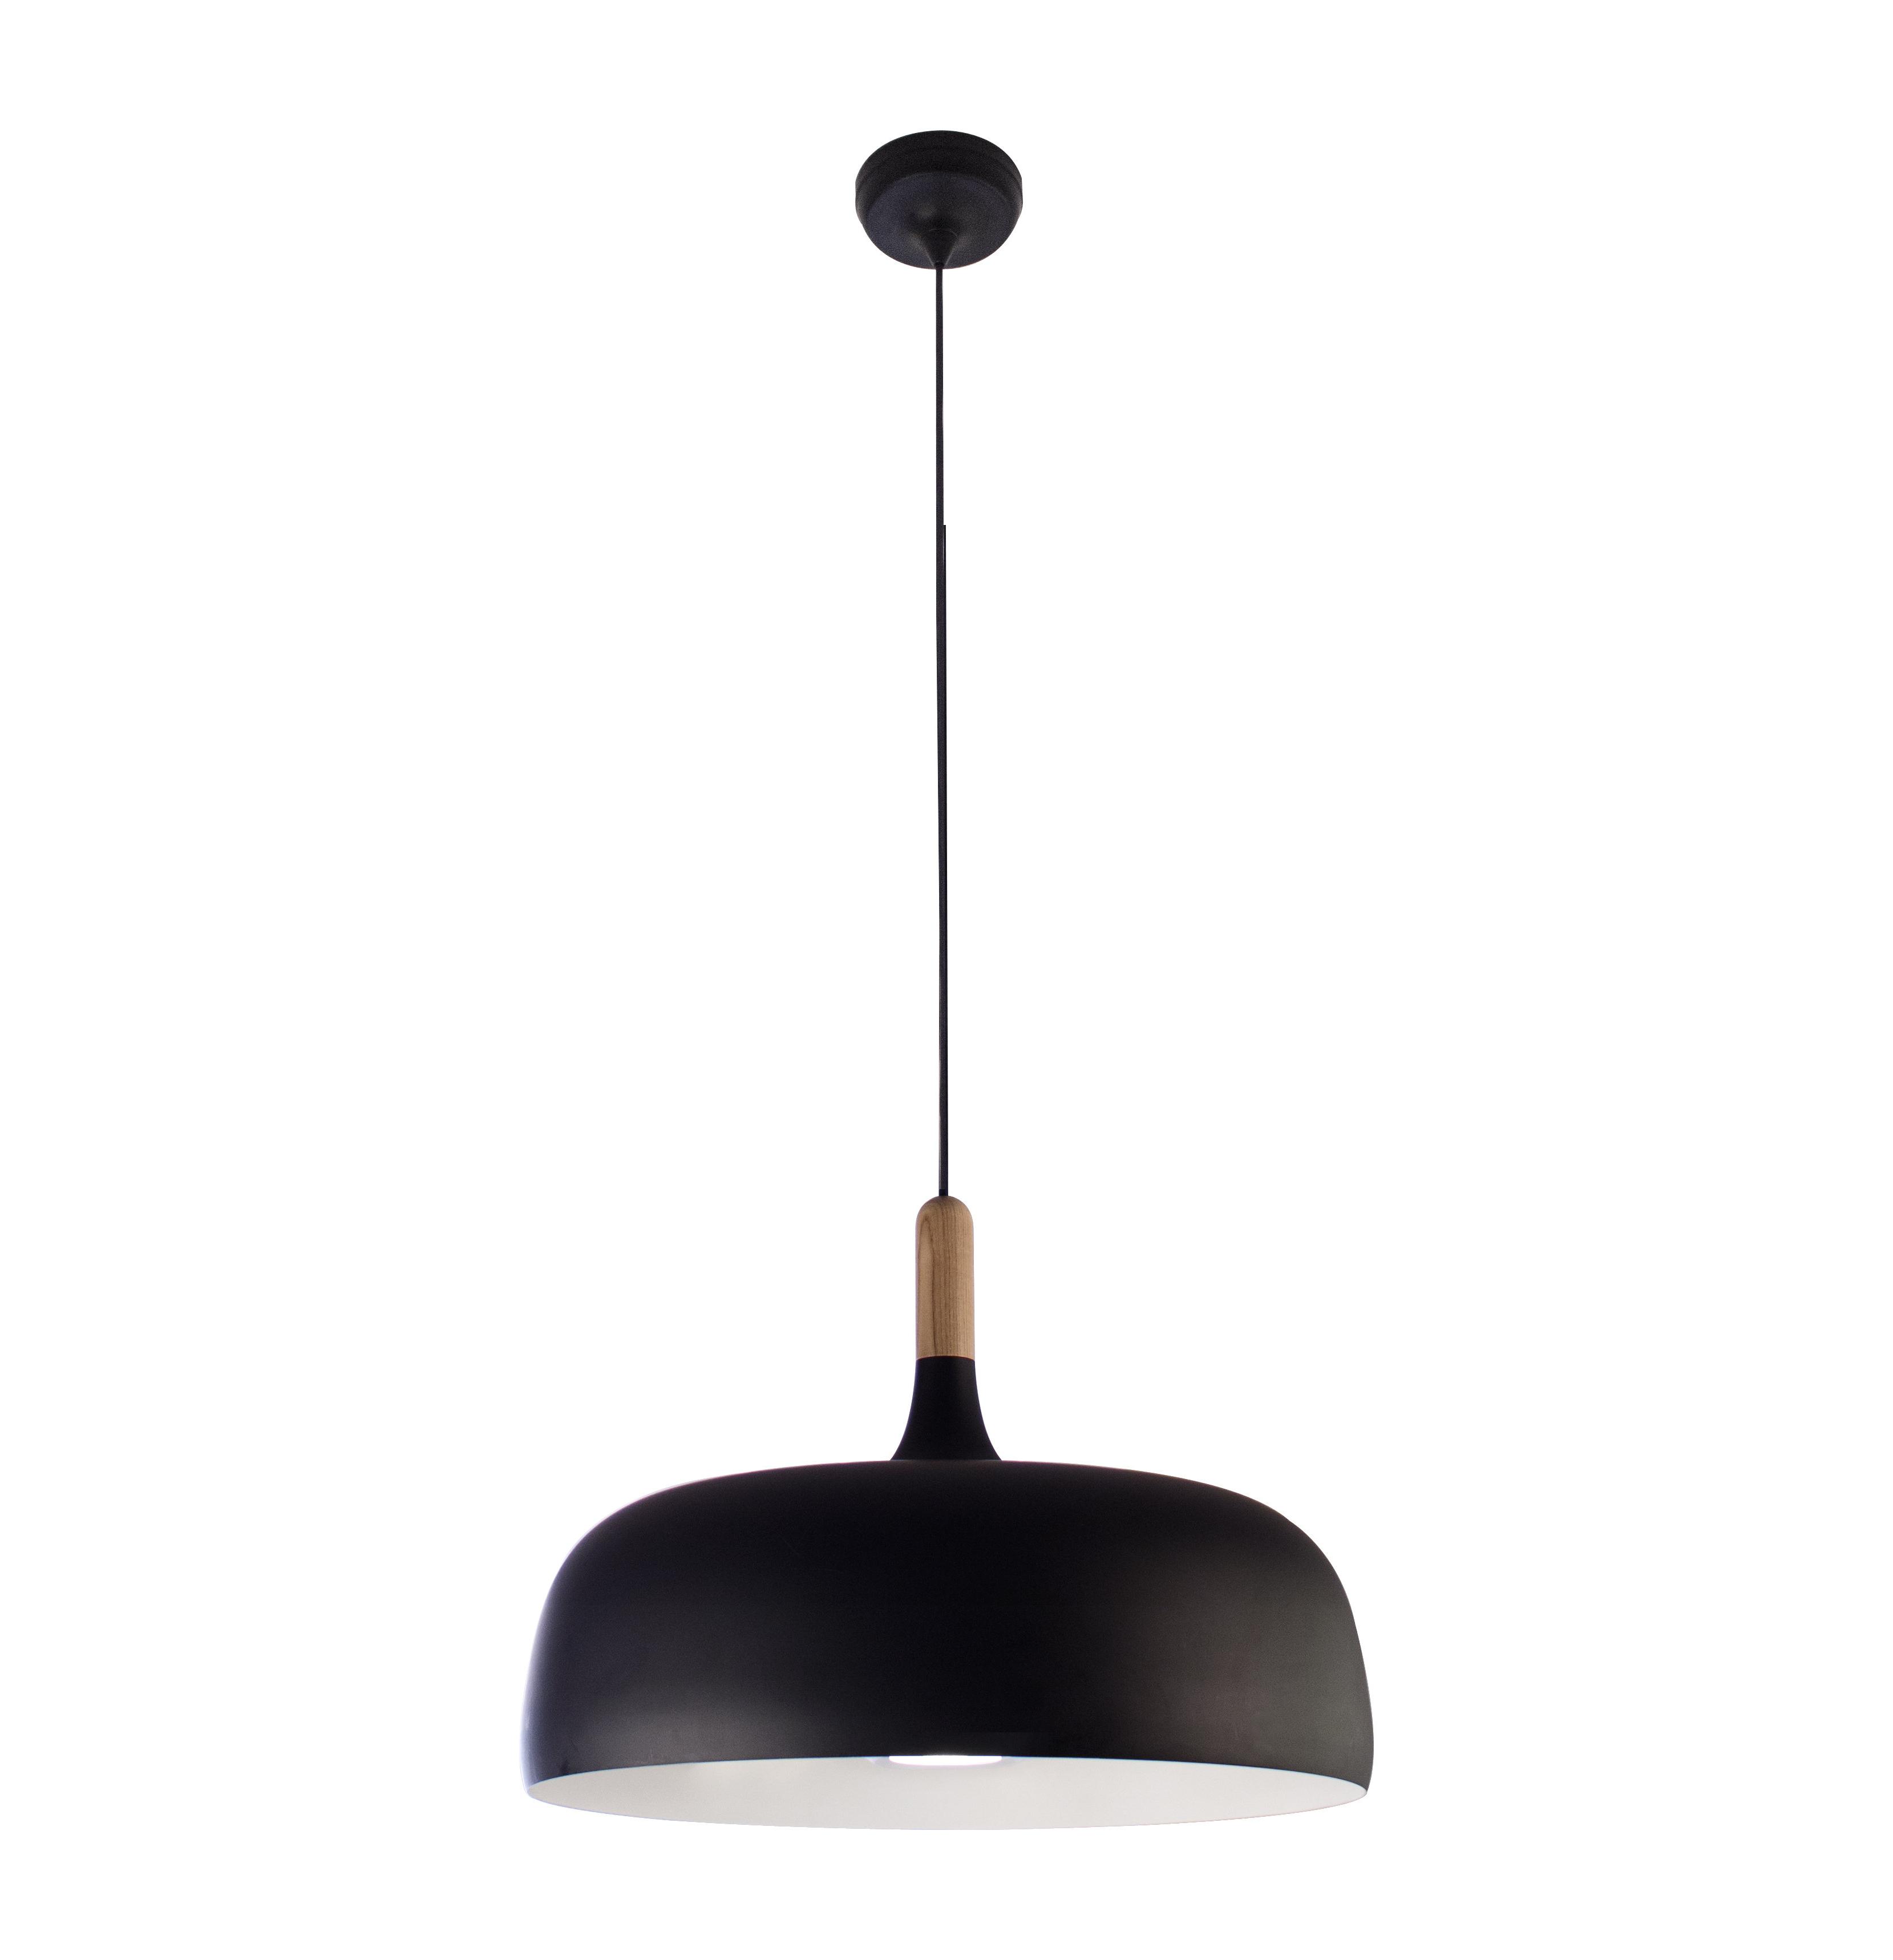 Ryker 1 Light Single Dome Pendant Throughout 2020 Stetson 1 Light Bowl Pendants (Gallery 6 of 20)